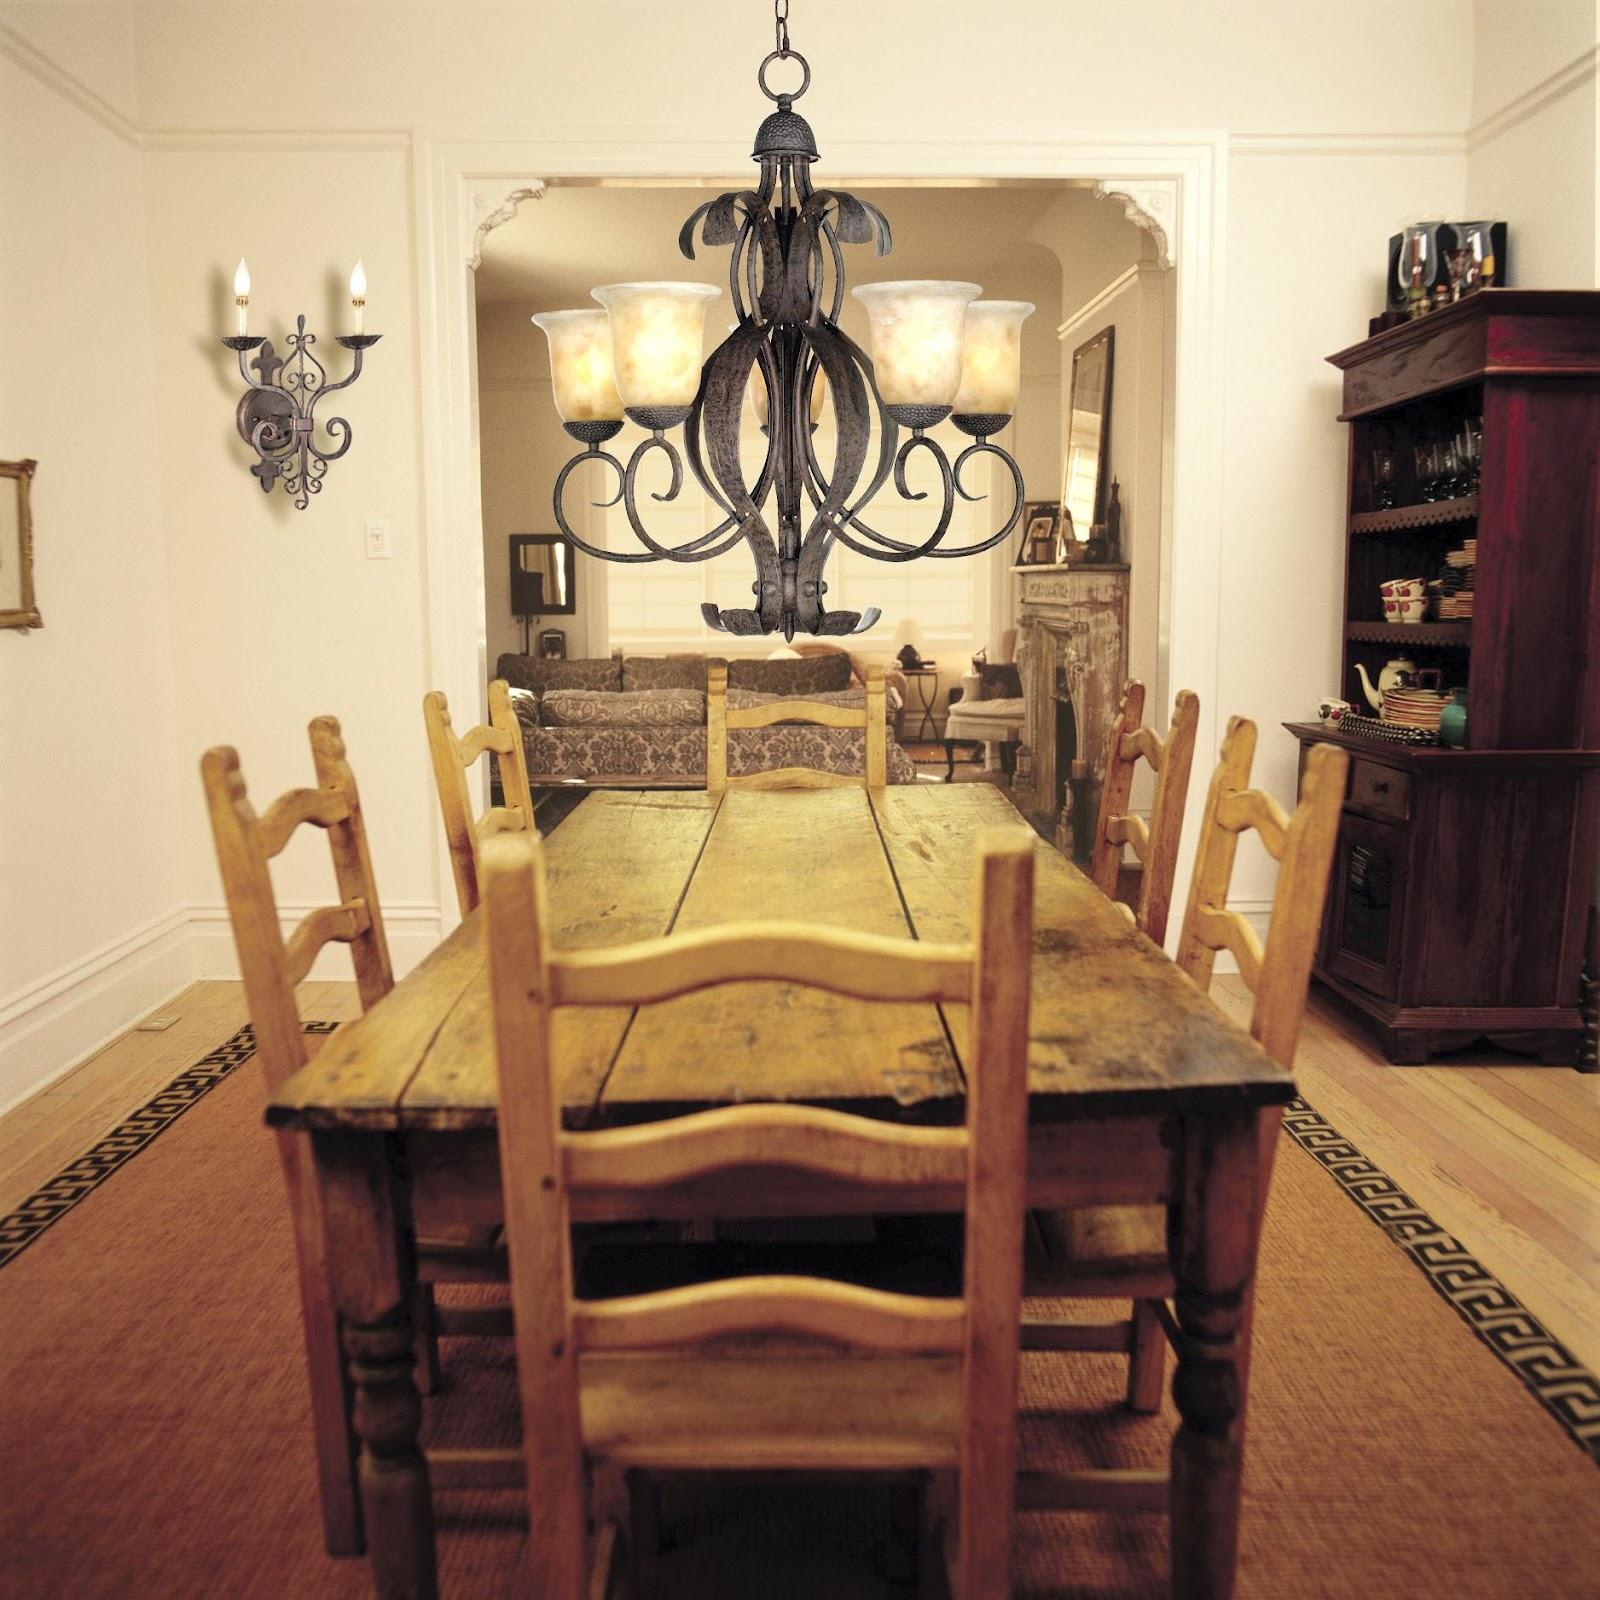 black chandelier table lamp photo - 2